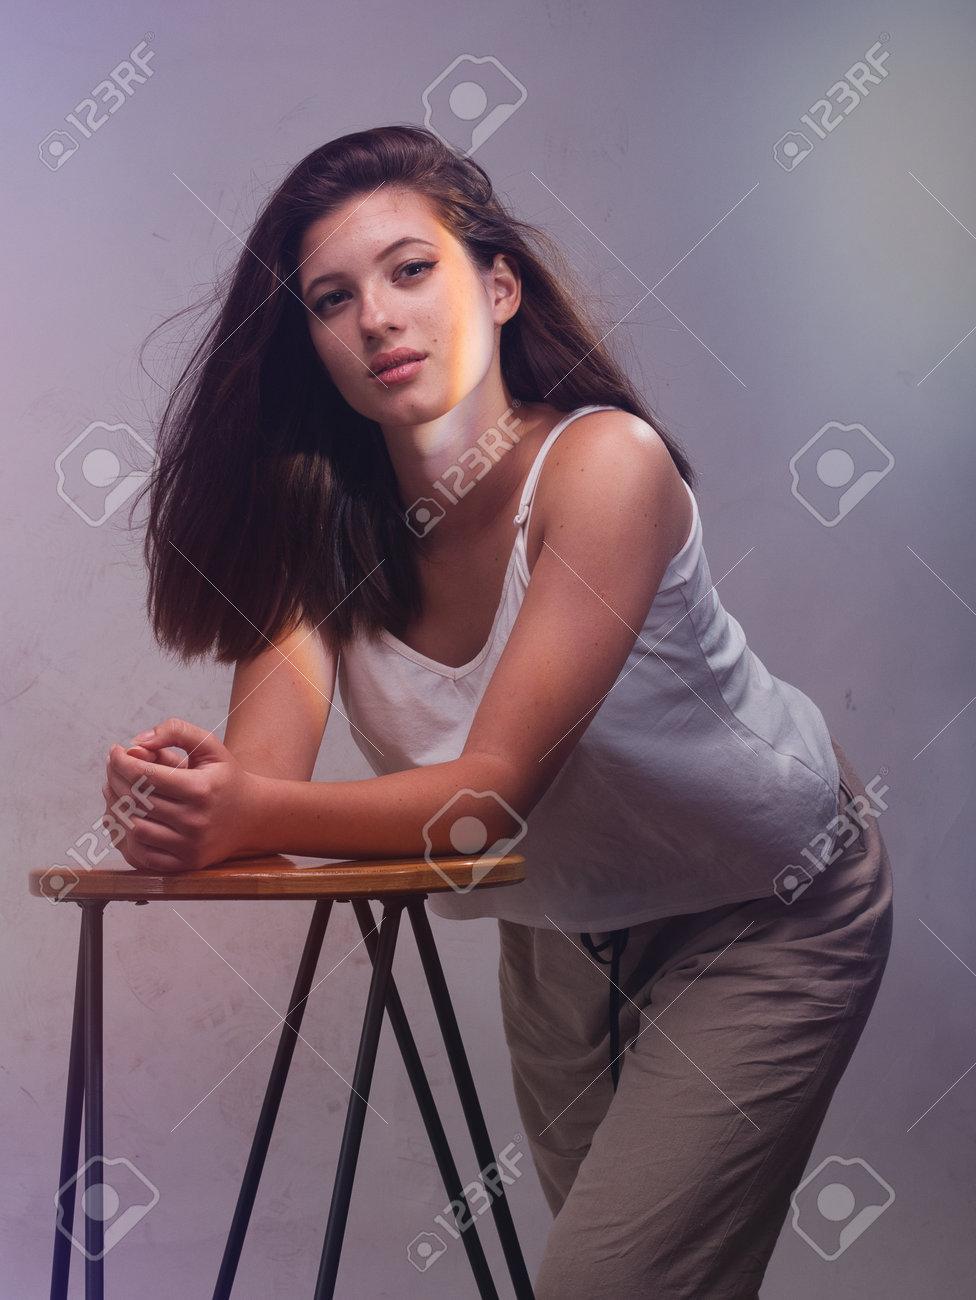 high key. Conceptual portrait with plastic sheets. One young woman strugling with plastic sheets. - 164118907